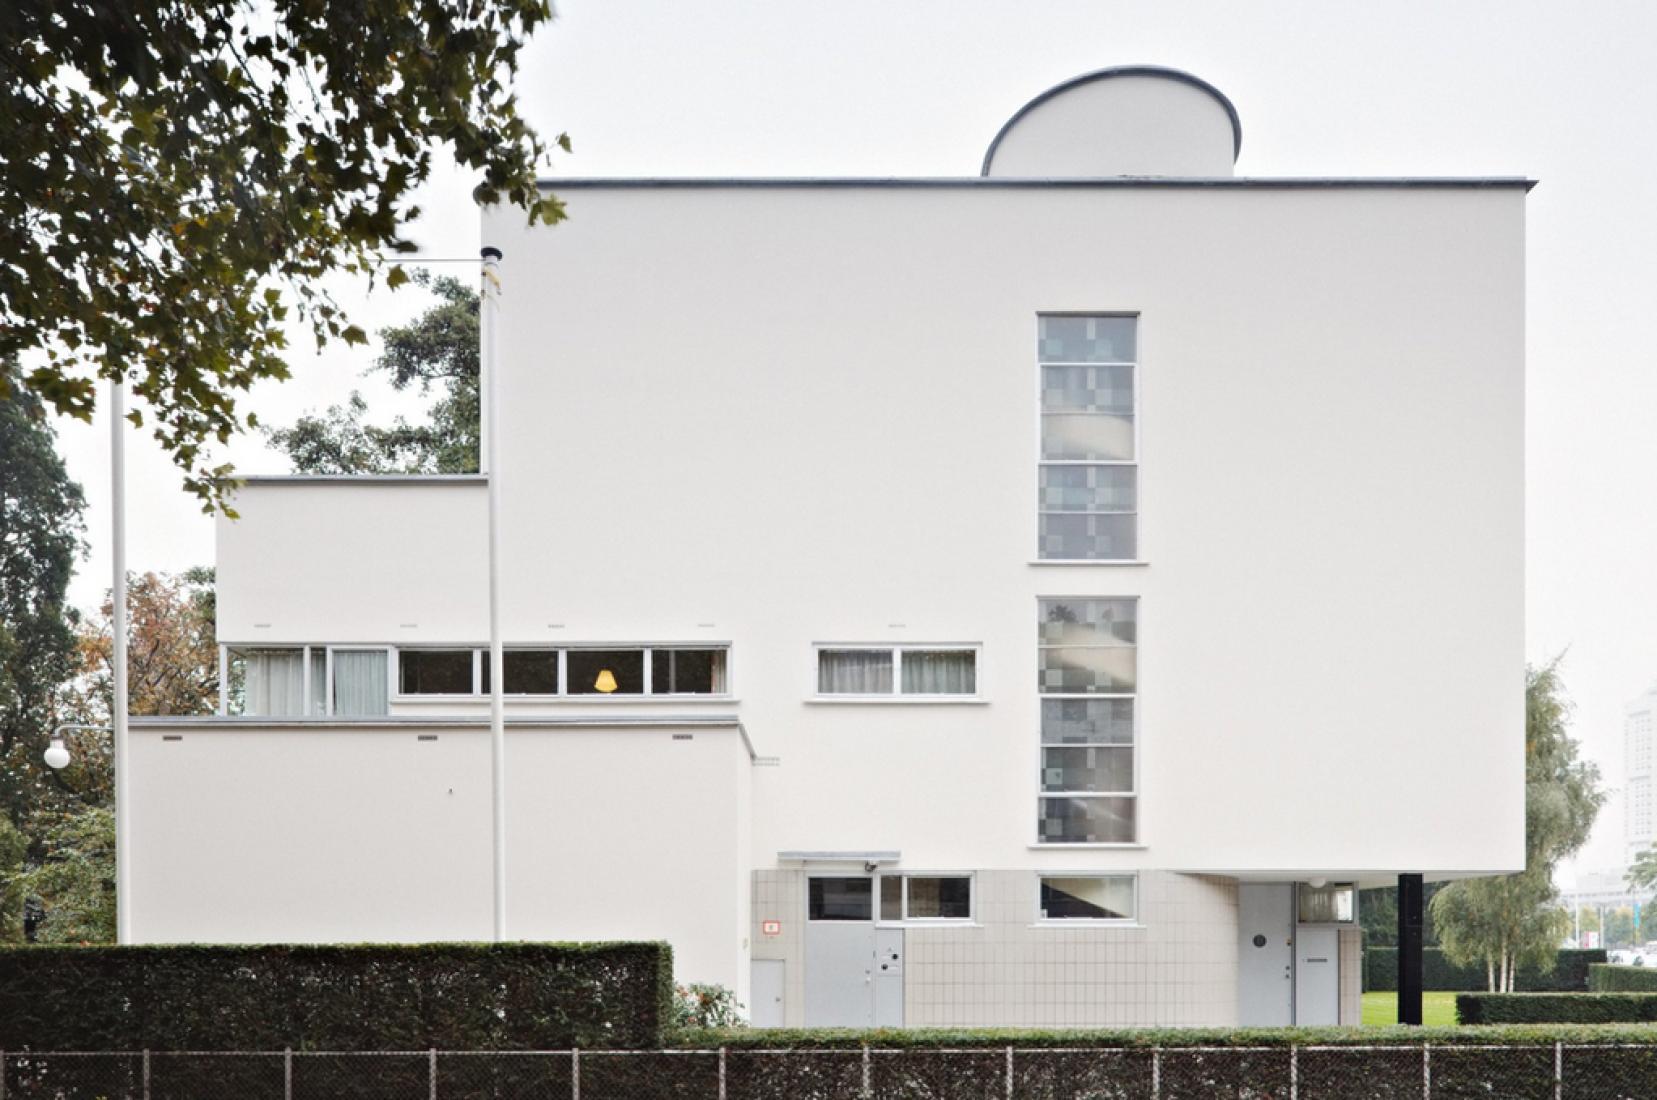 Outside vision. Sonneveld house. Photogrphy © Johannes Schwartz/Het Nieuwe Instituut, 2015.